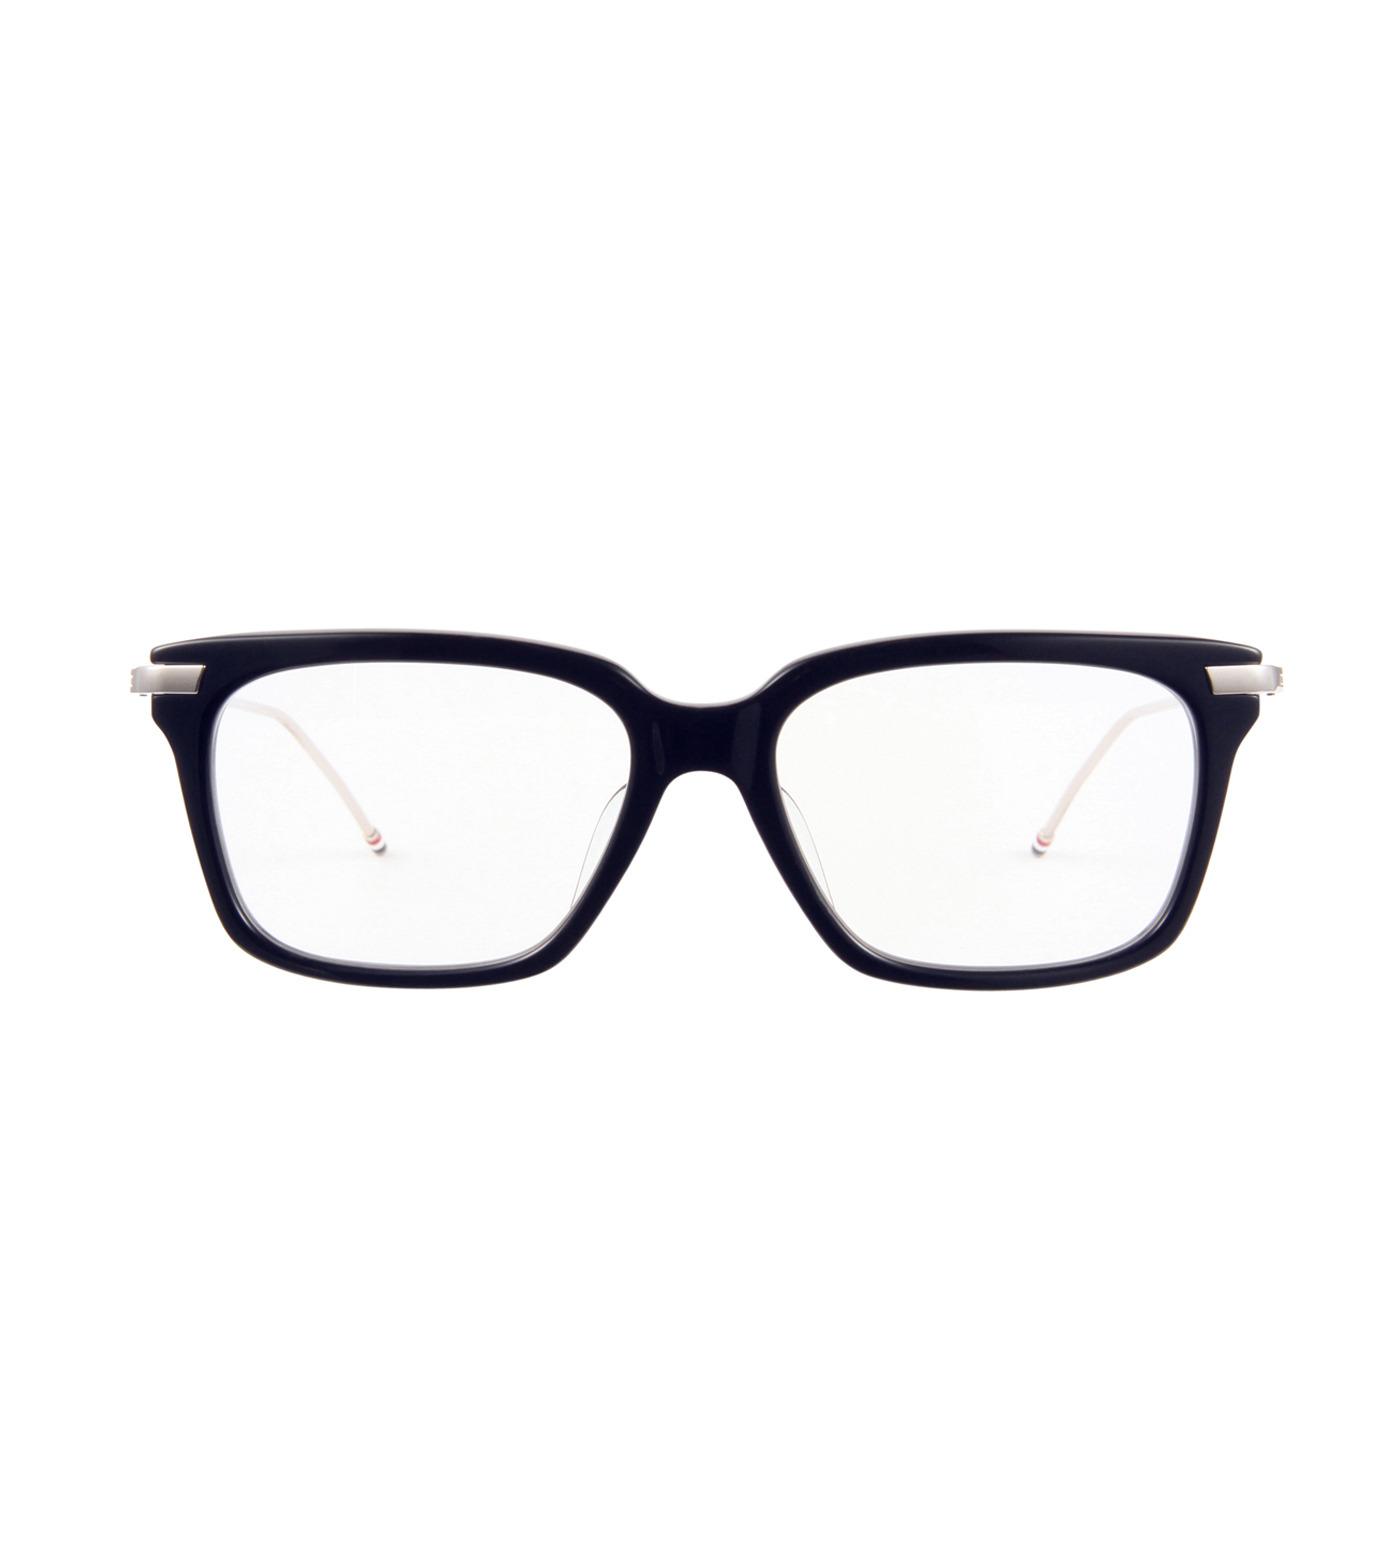 Thom Browne Eye Wear(トム・ブラウン・アイウェア)のWellington Clear Lens-NAVY(アイウェア/eyewear)-TB-701-H-93 拡大詳細画像3